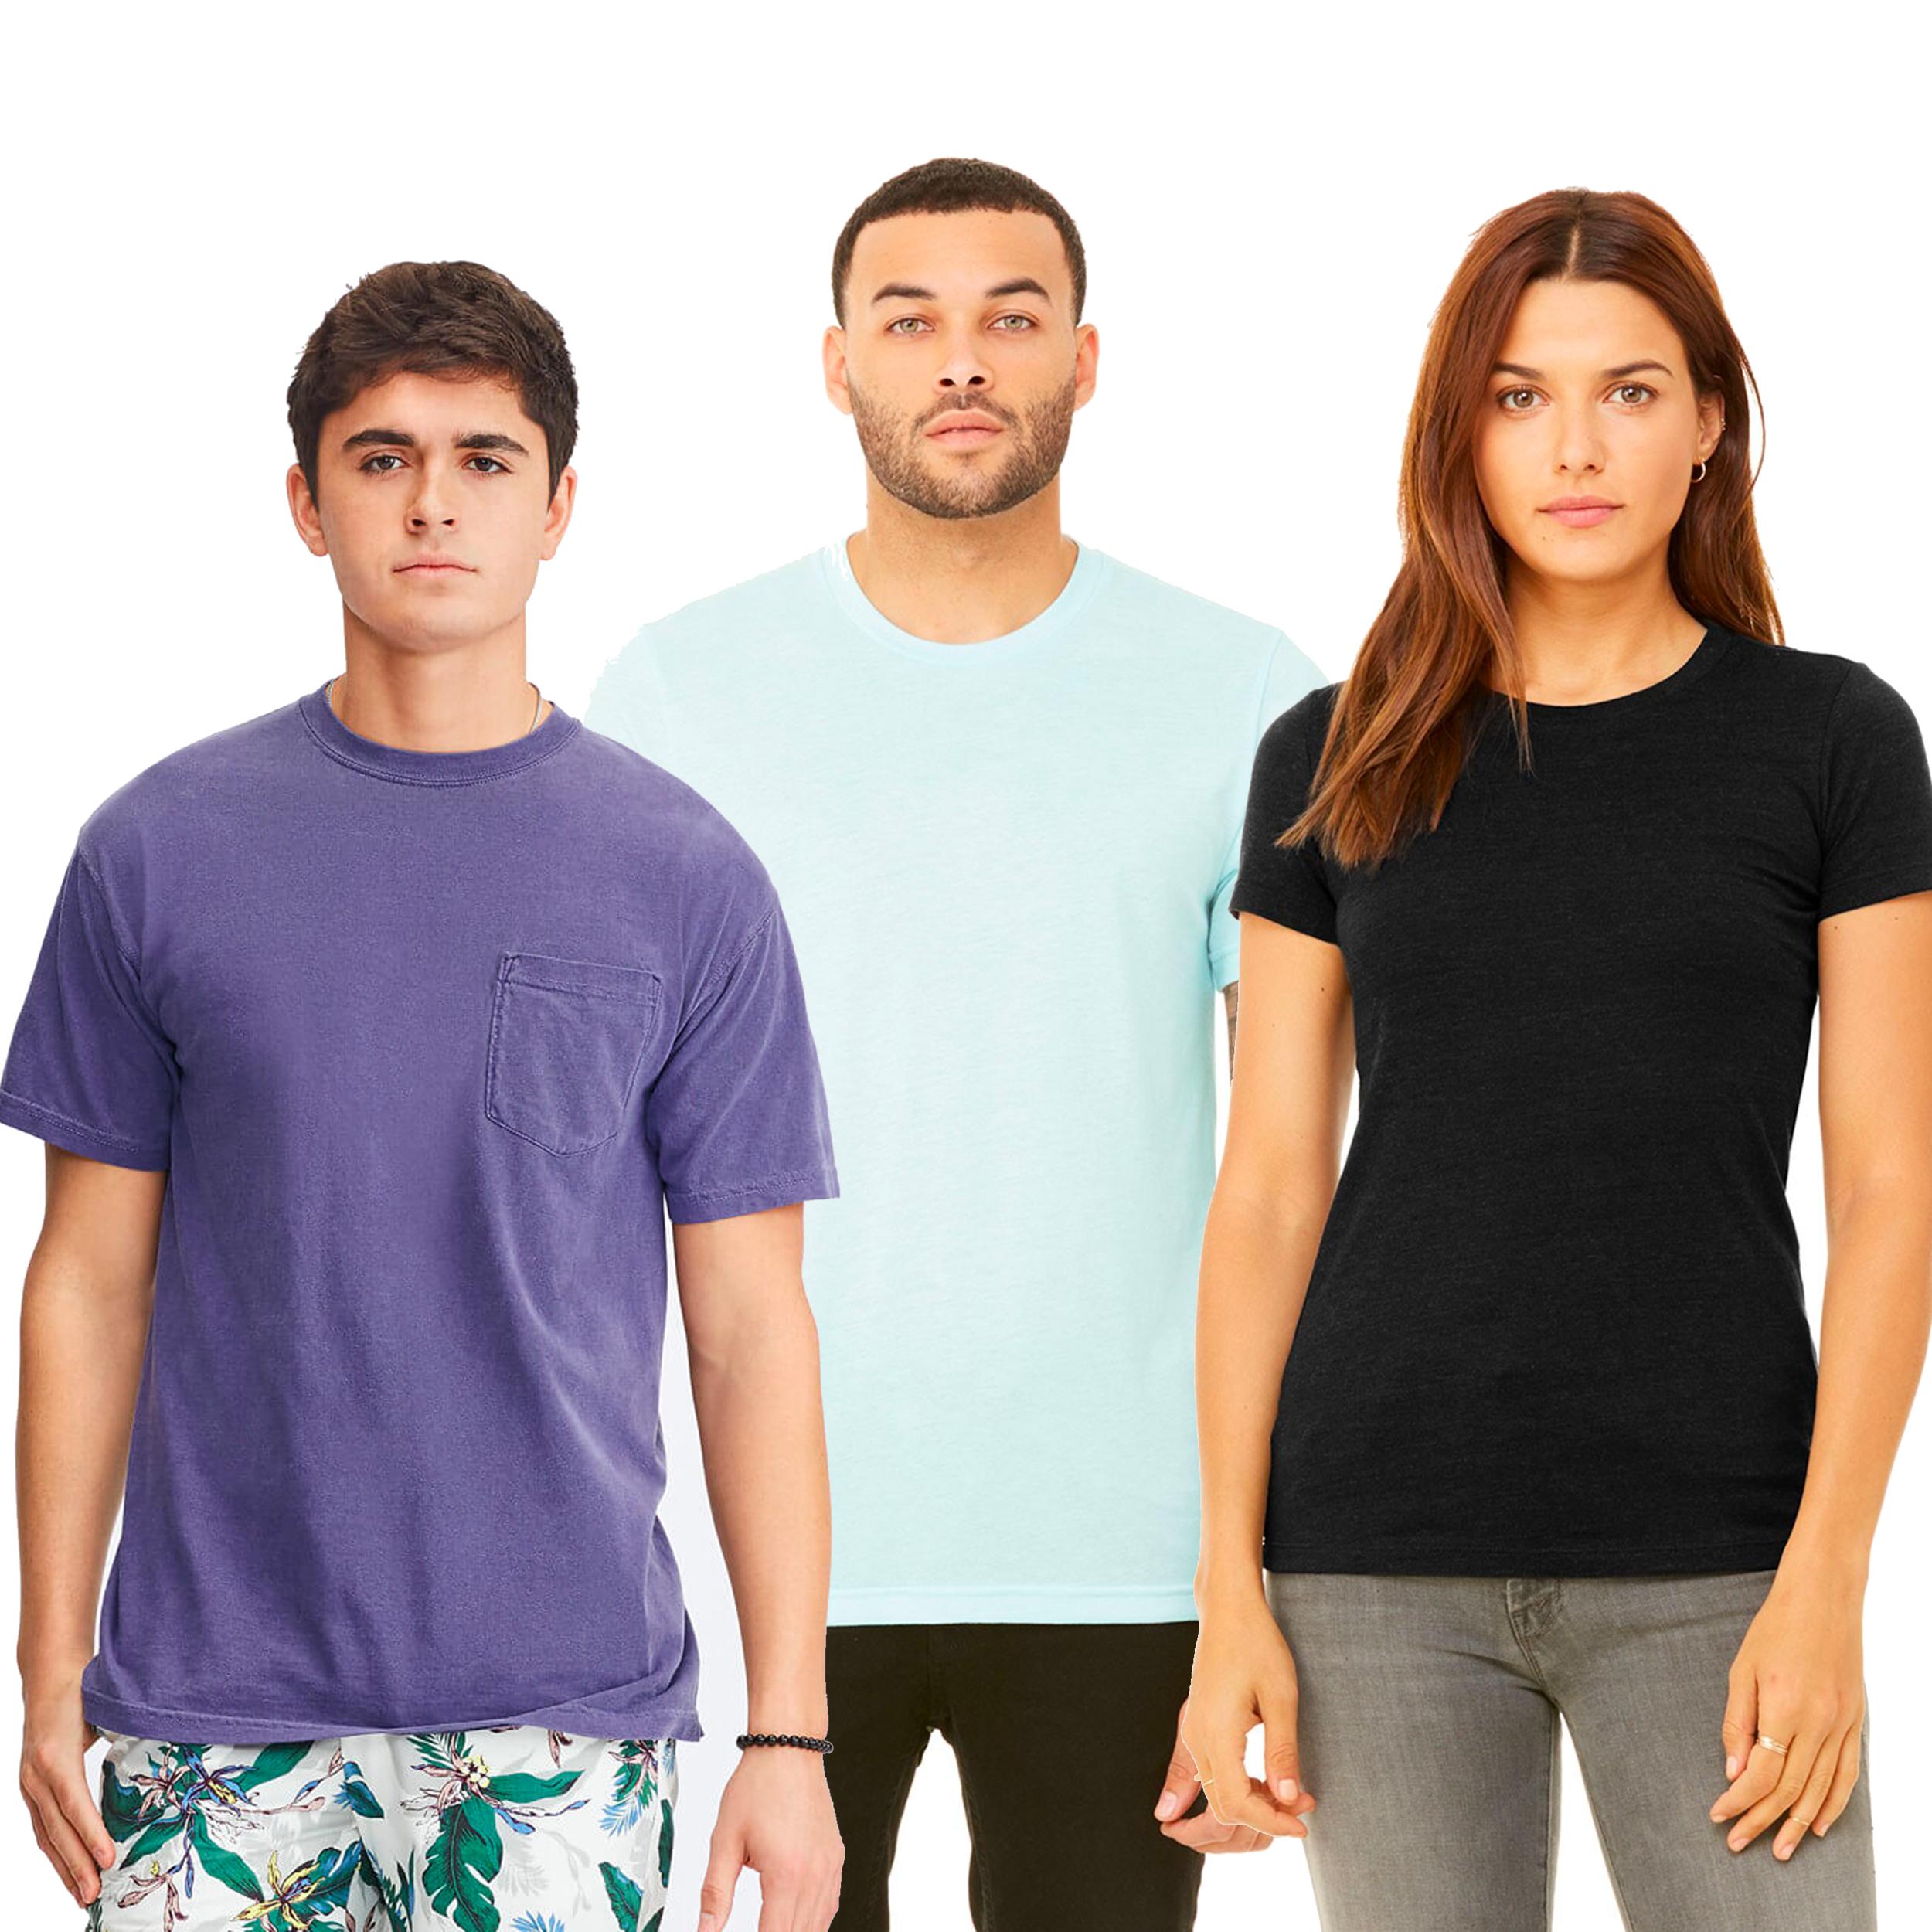 Premium products - Brands like: Comfort Colors, Bella & Canvas, Next Level